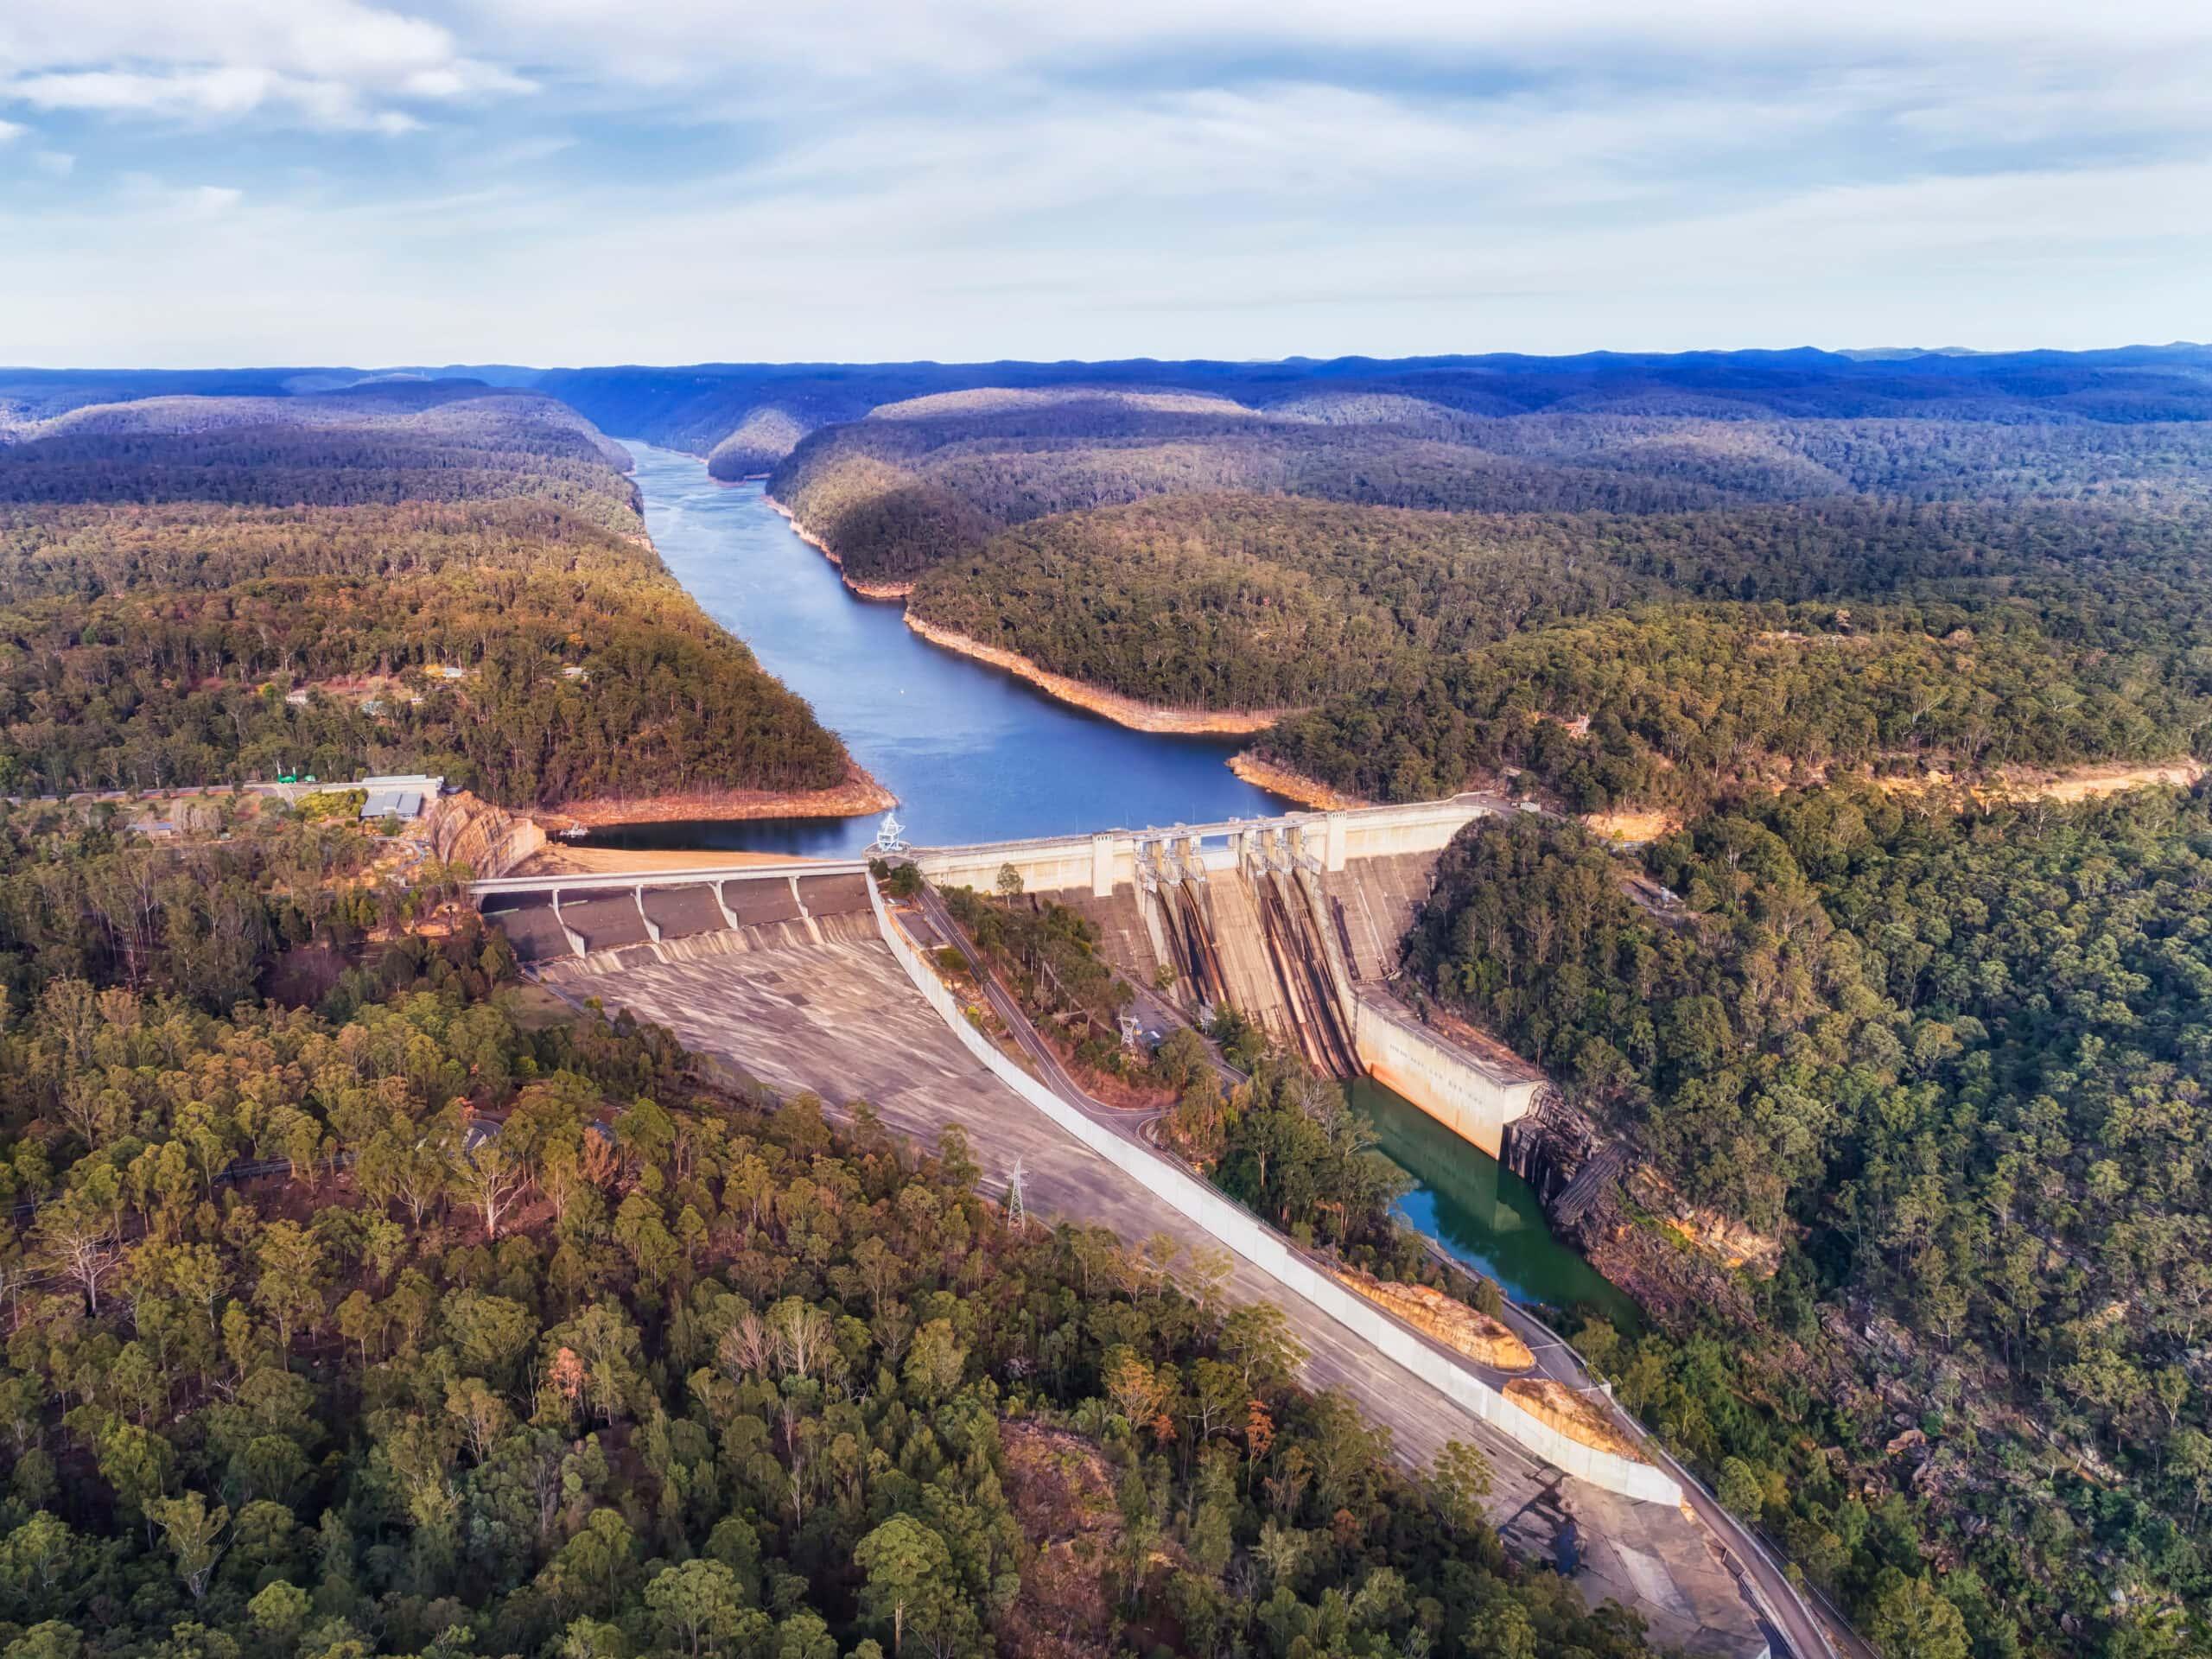 Concrete,Warragamba,Dam,On,Warragamba,River,Locking,Flow,Of,Fresh